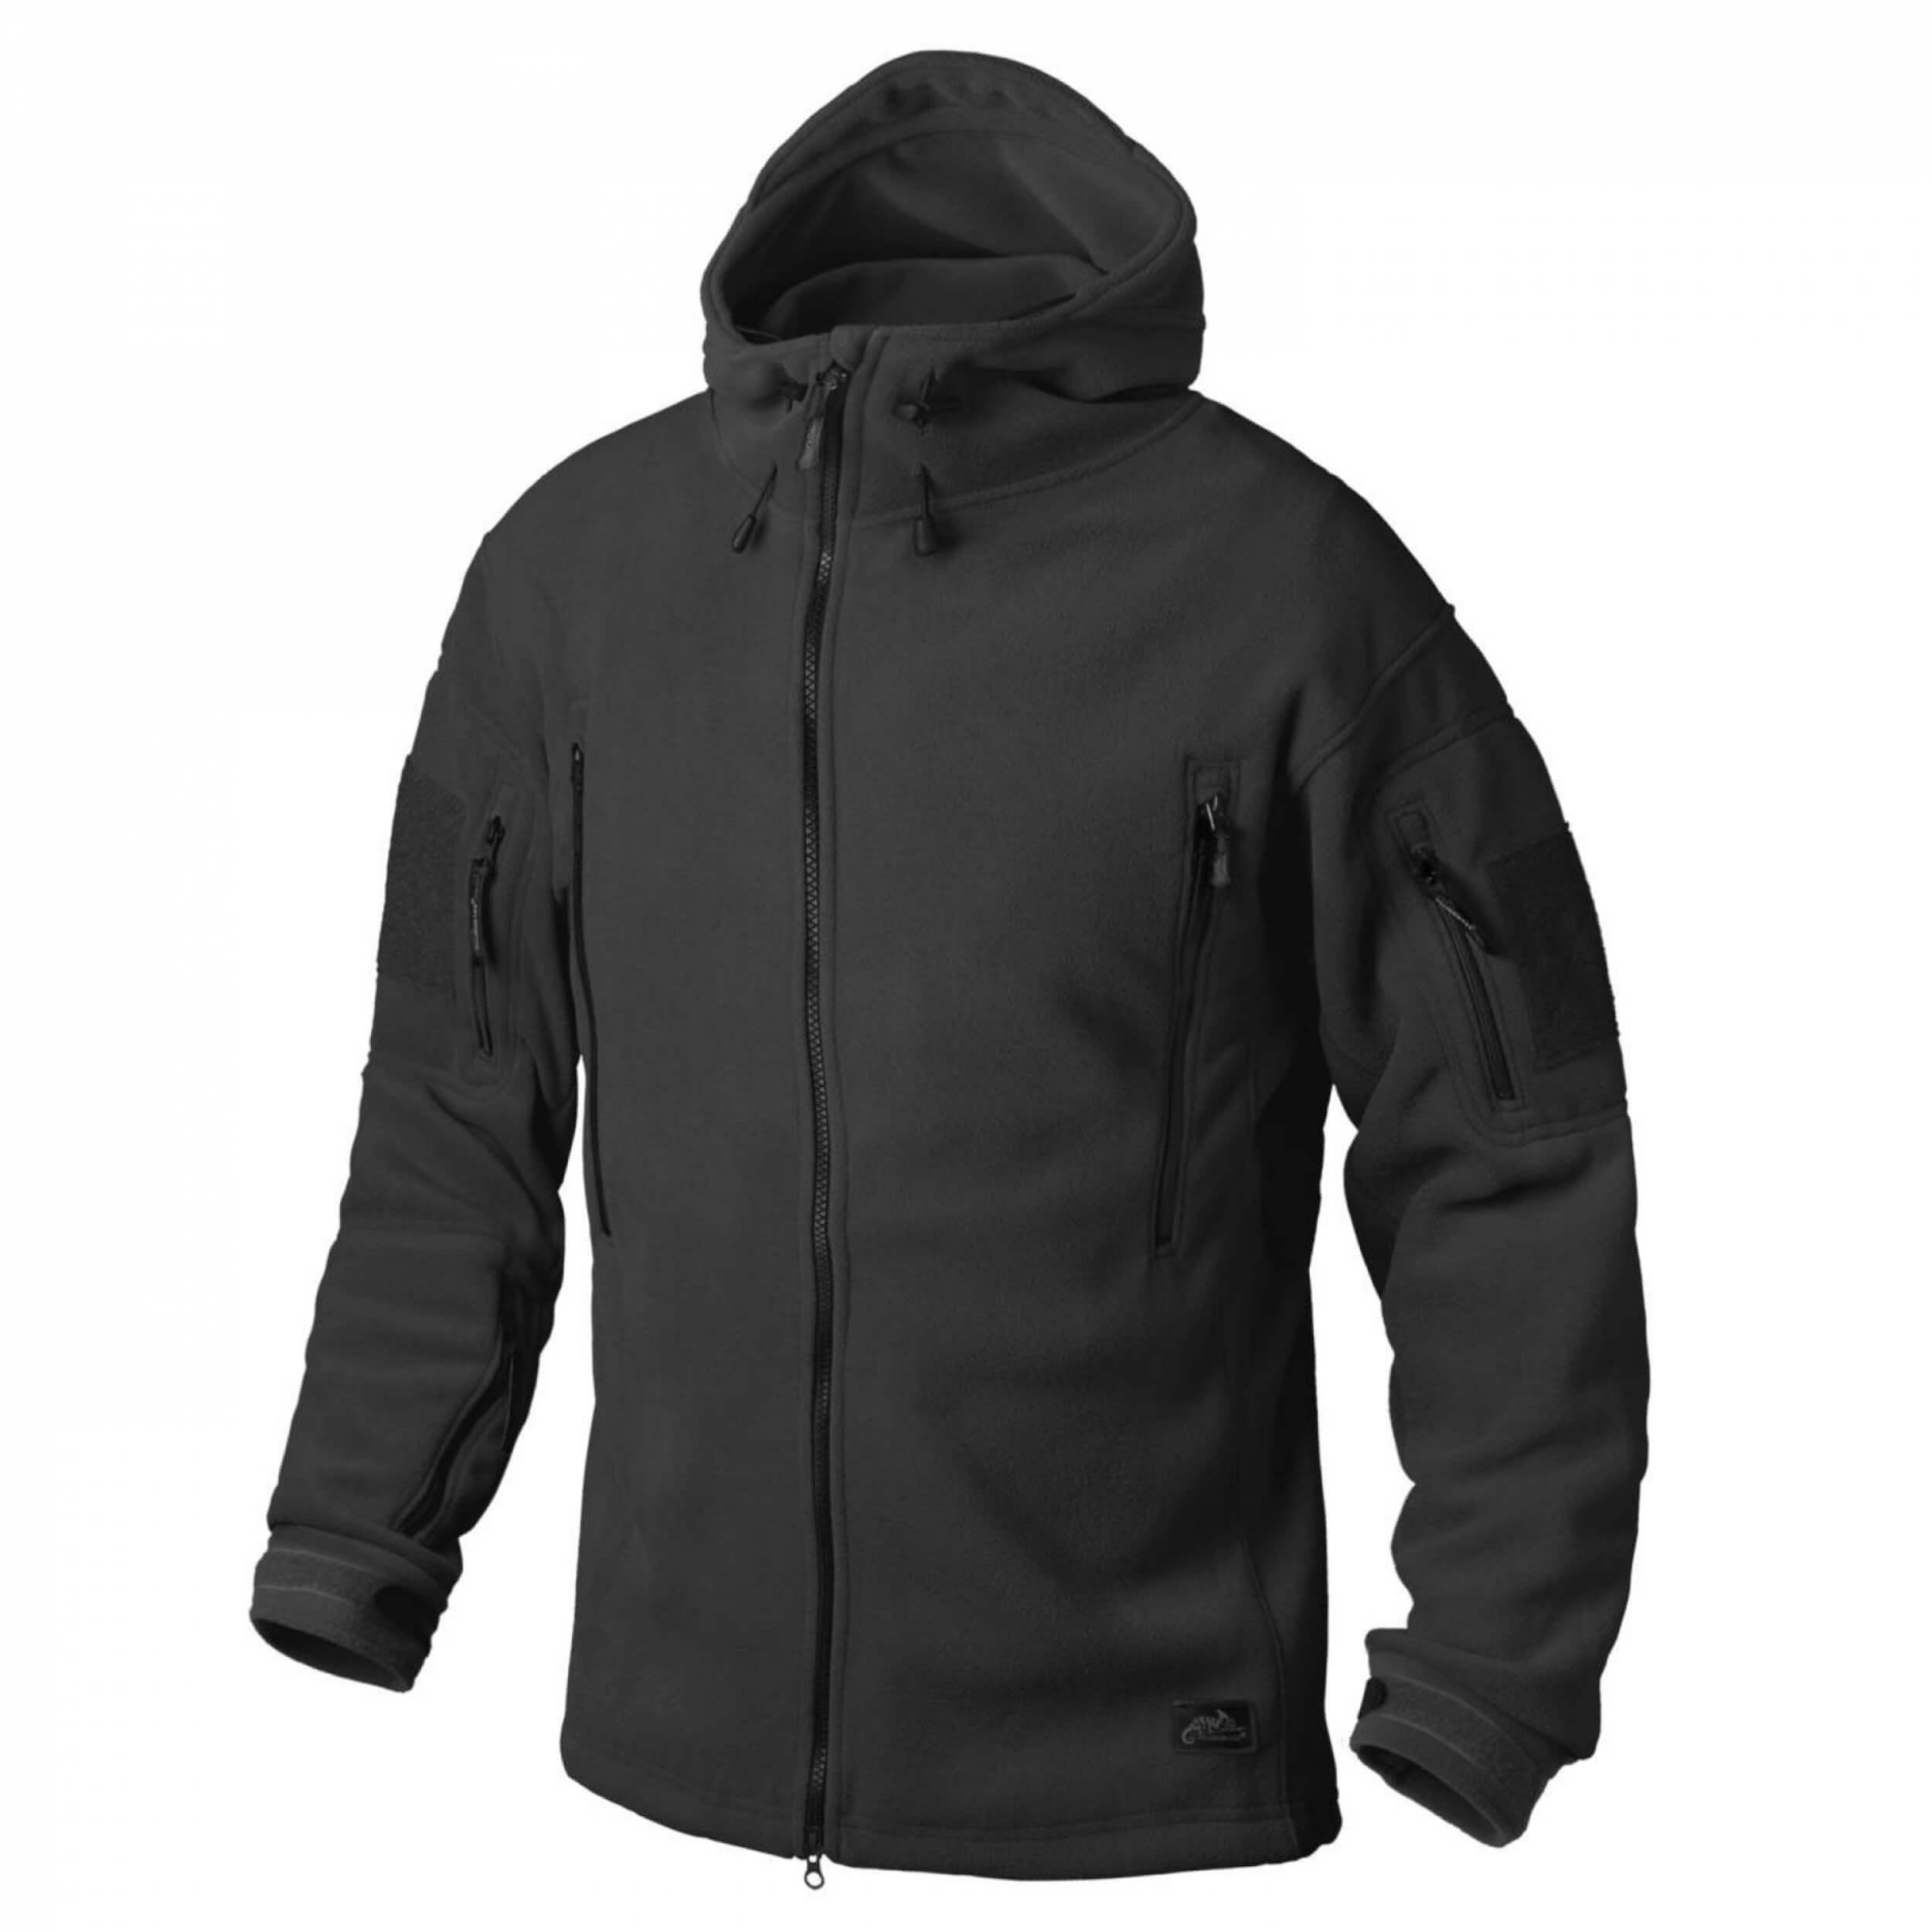 Helikon-Tex Patriot Jacke - Double Fleece black